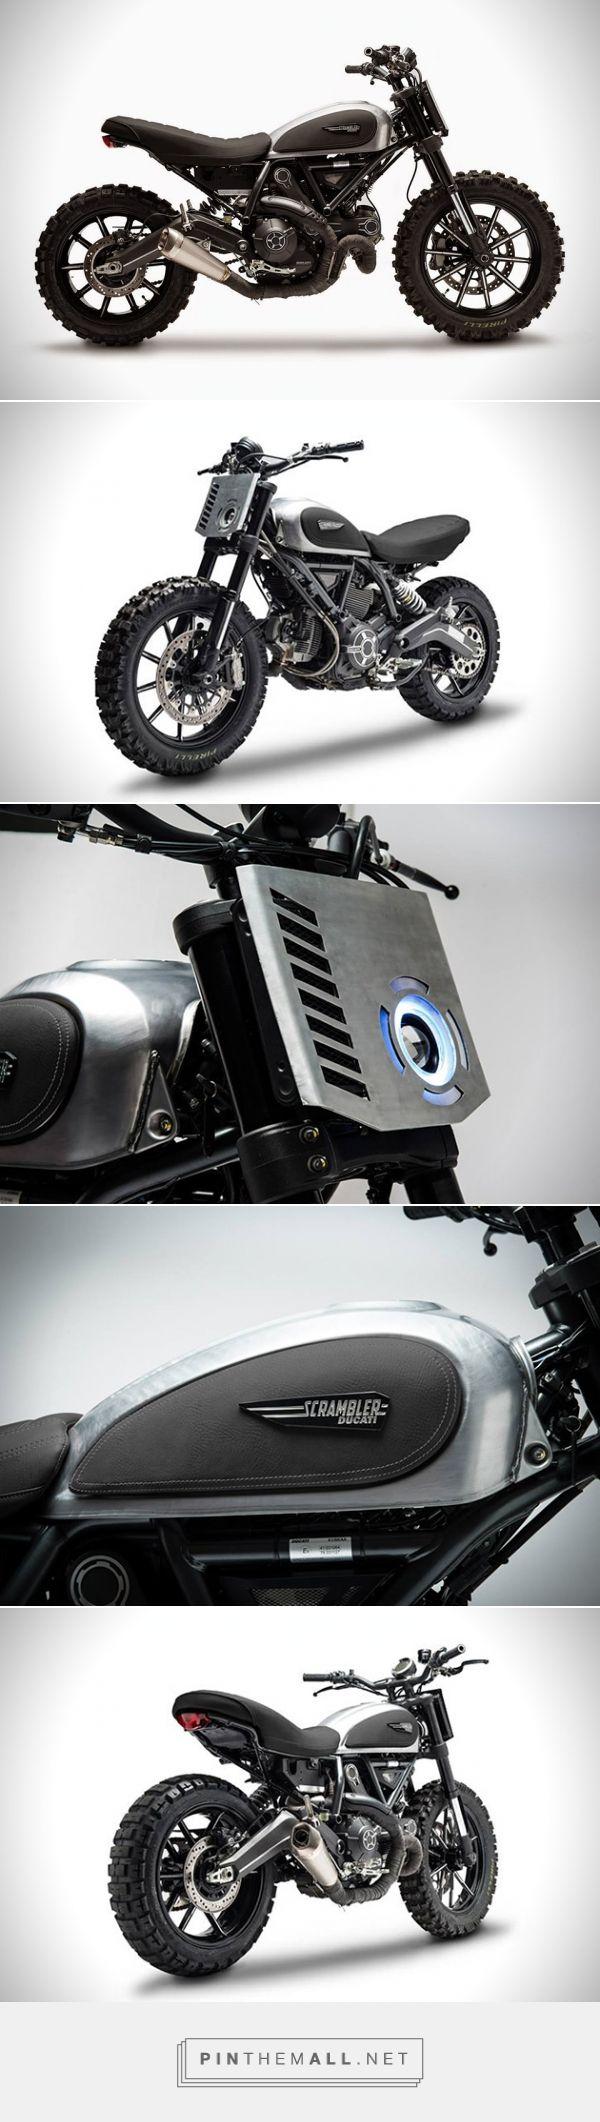 Ducati Scrambler Dirt Tracker | HiConsumption - created via http://pinthemall.net